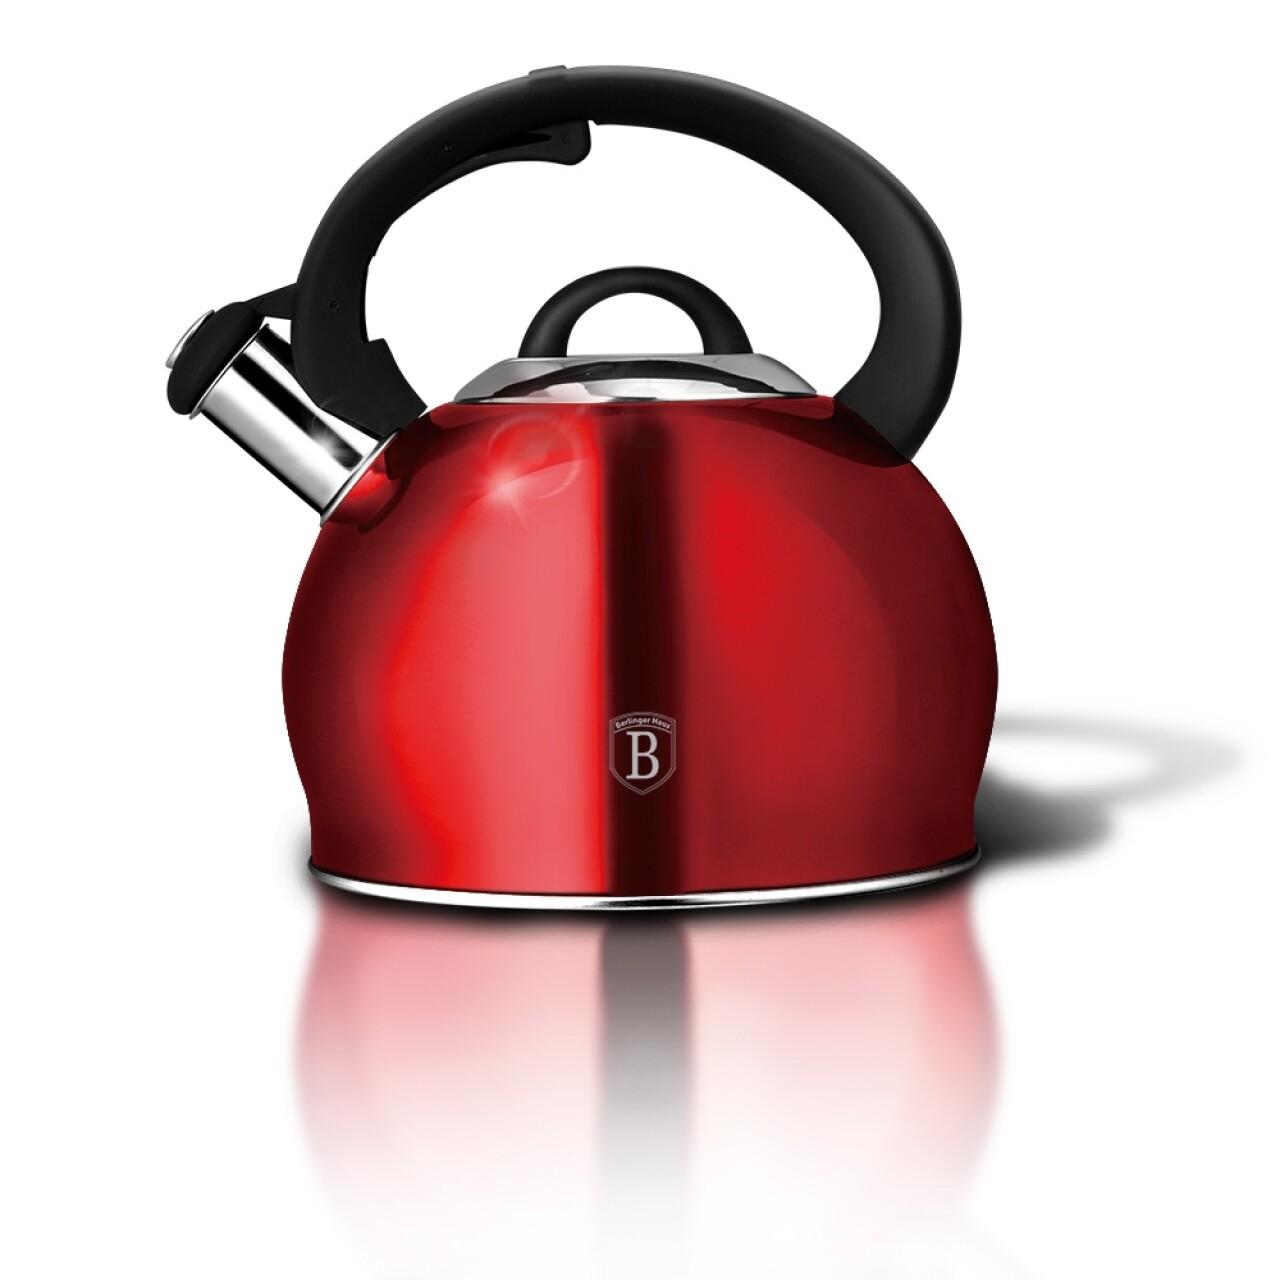 Ceainic cu fluier, Berlinger Haus, 3 L, inox,  Burgundy